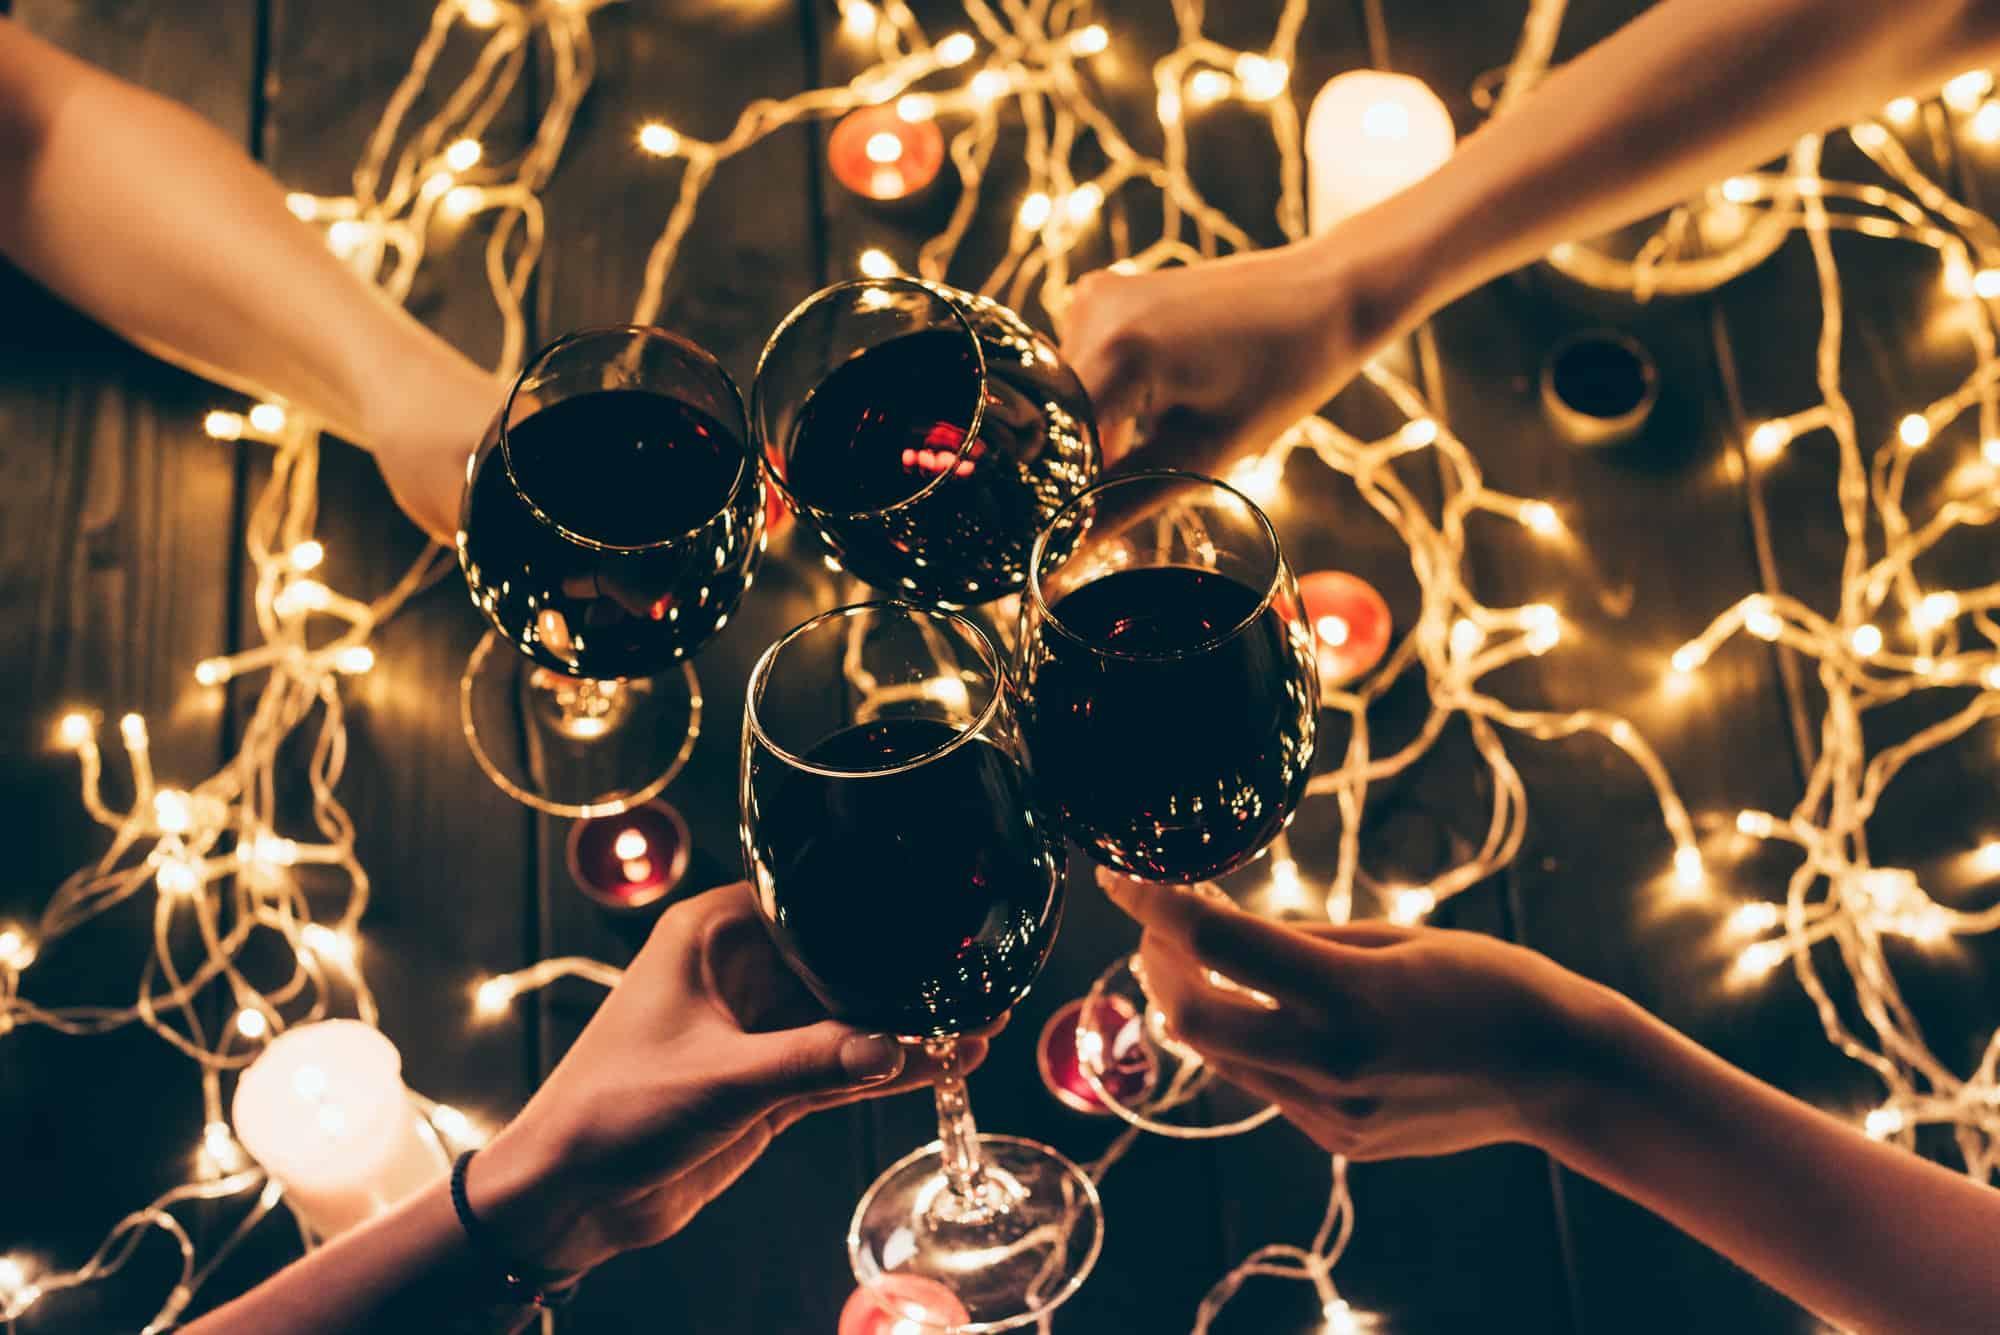 friends sharing wine around christmas lights